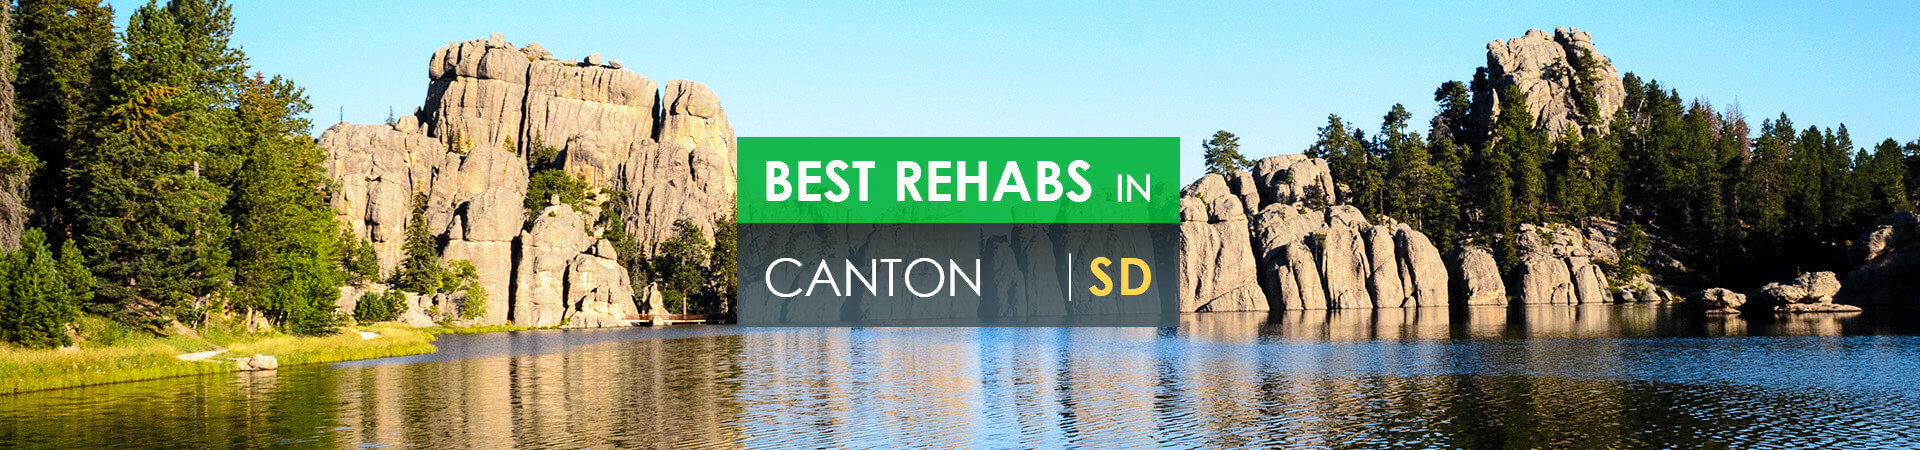 Best rehabs in Canton, SD